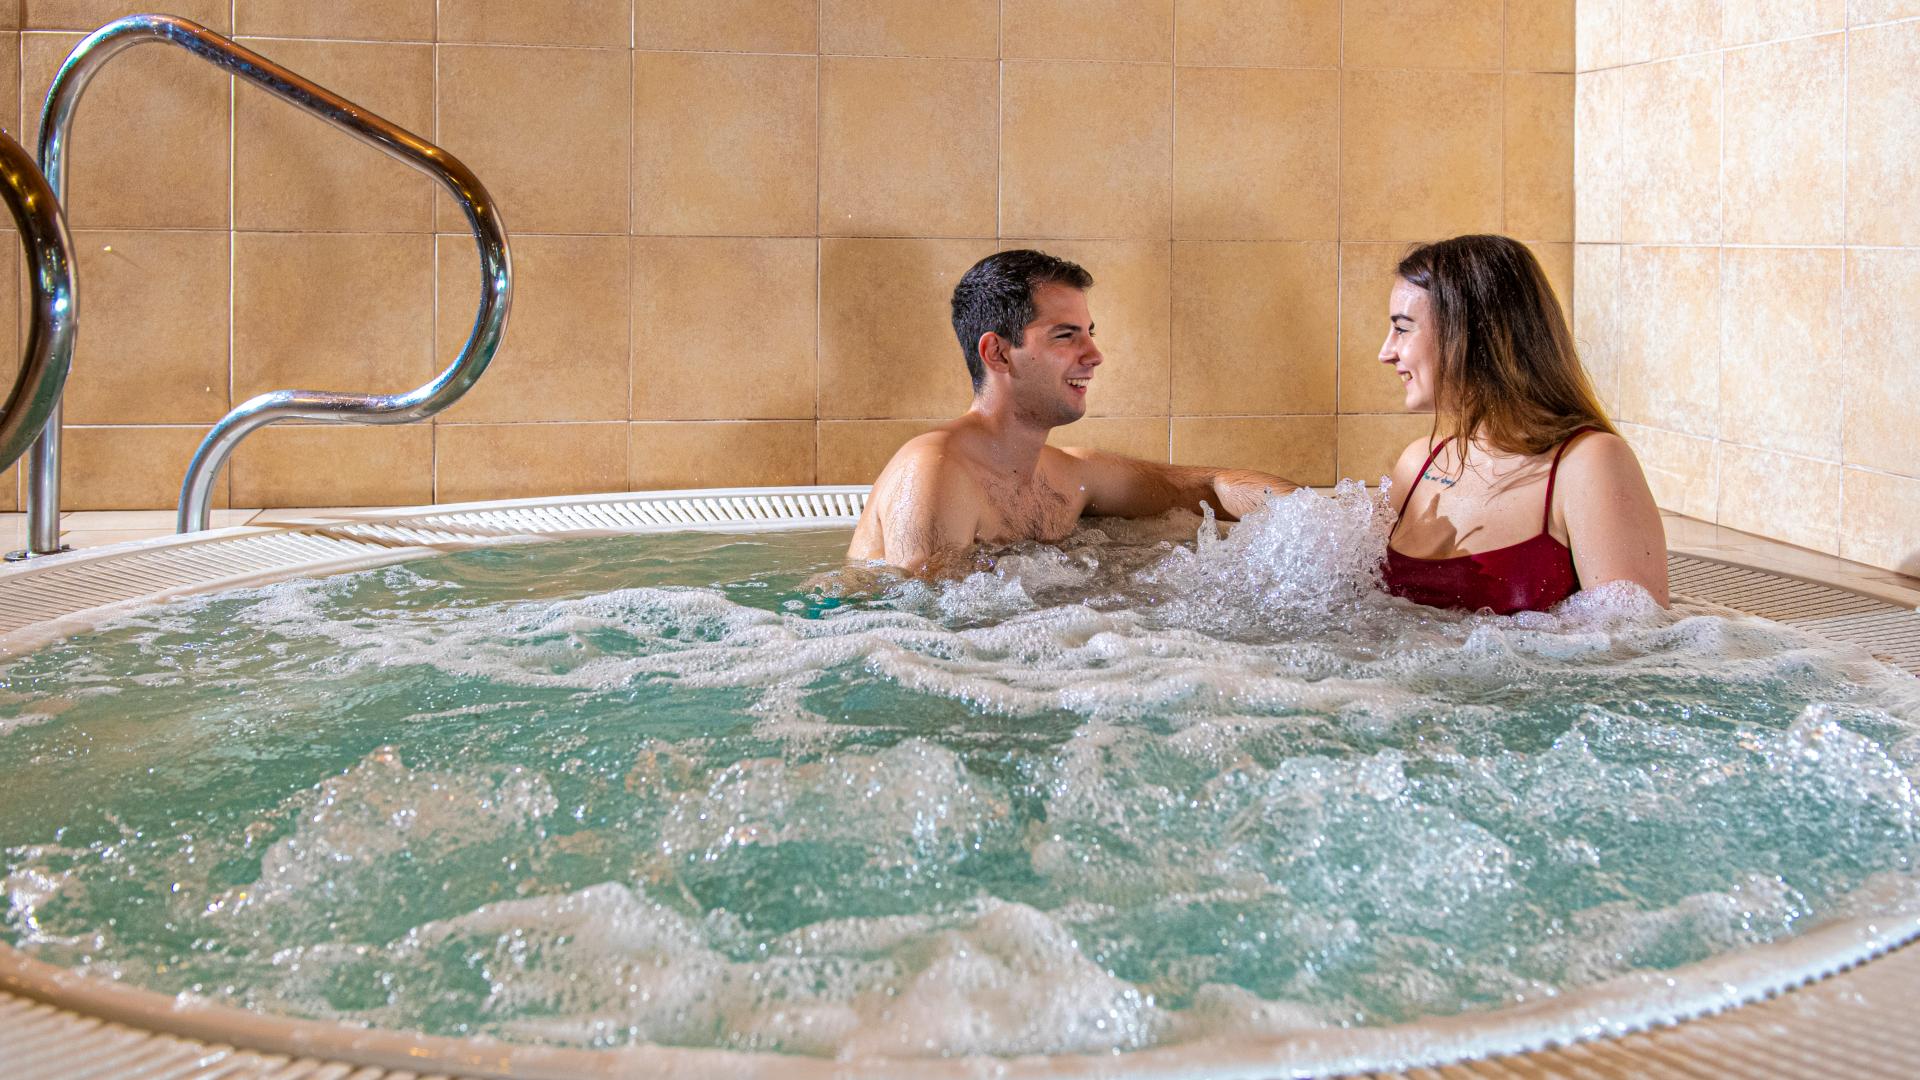 Balaton parti üdülés - privát strand Tihanyban - Wellness, spa és privát strand a Balaton partján - Club Tihany